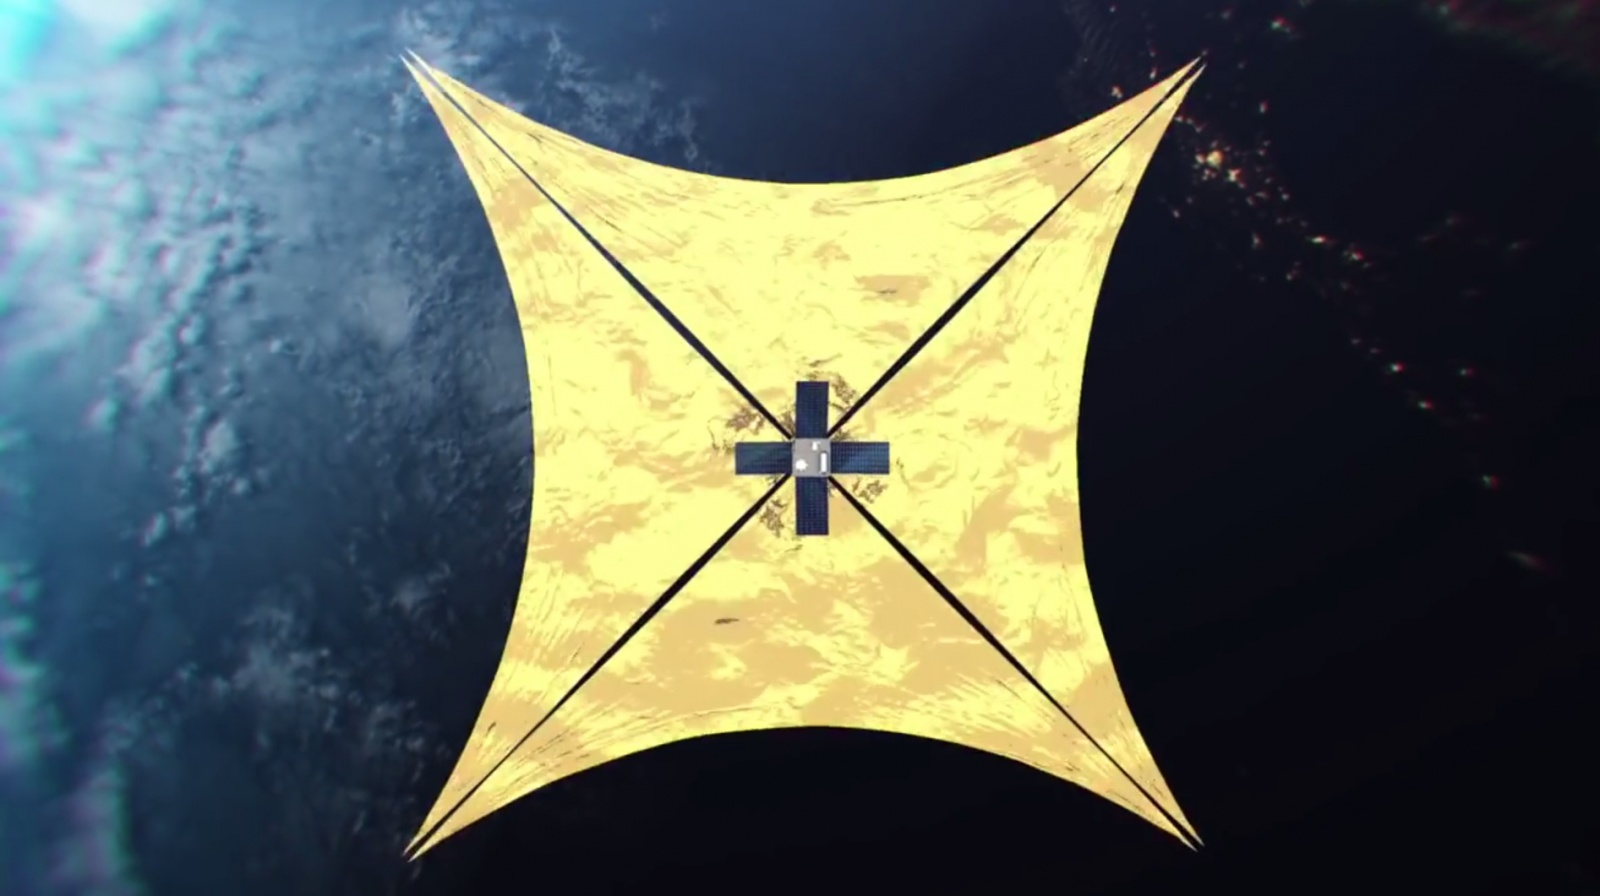 Облачно, вероятна неотключаемая реклама на звездном небе - 14